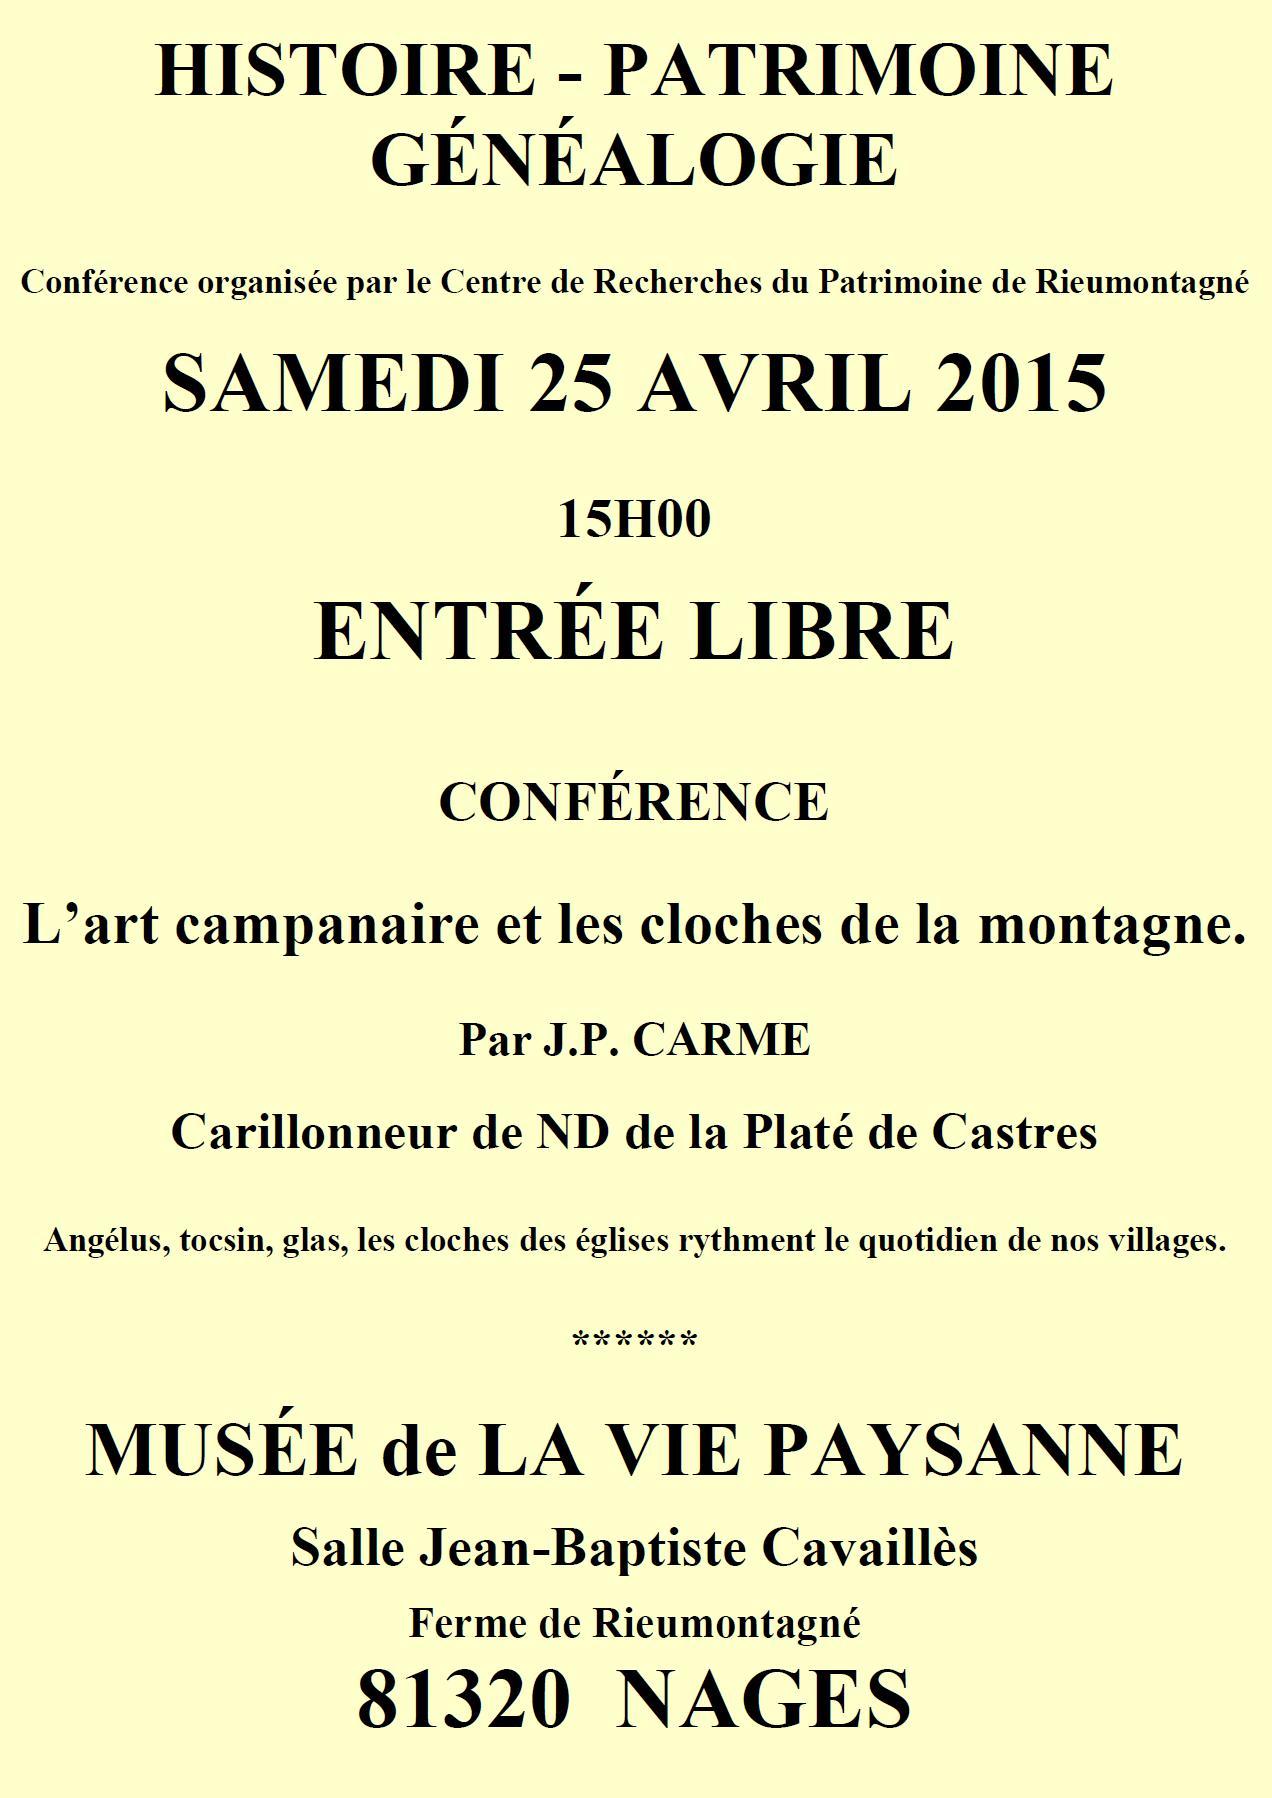 Samedi 25 avril 2014 – Après-midi du patrimoine